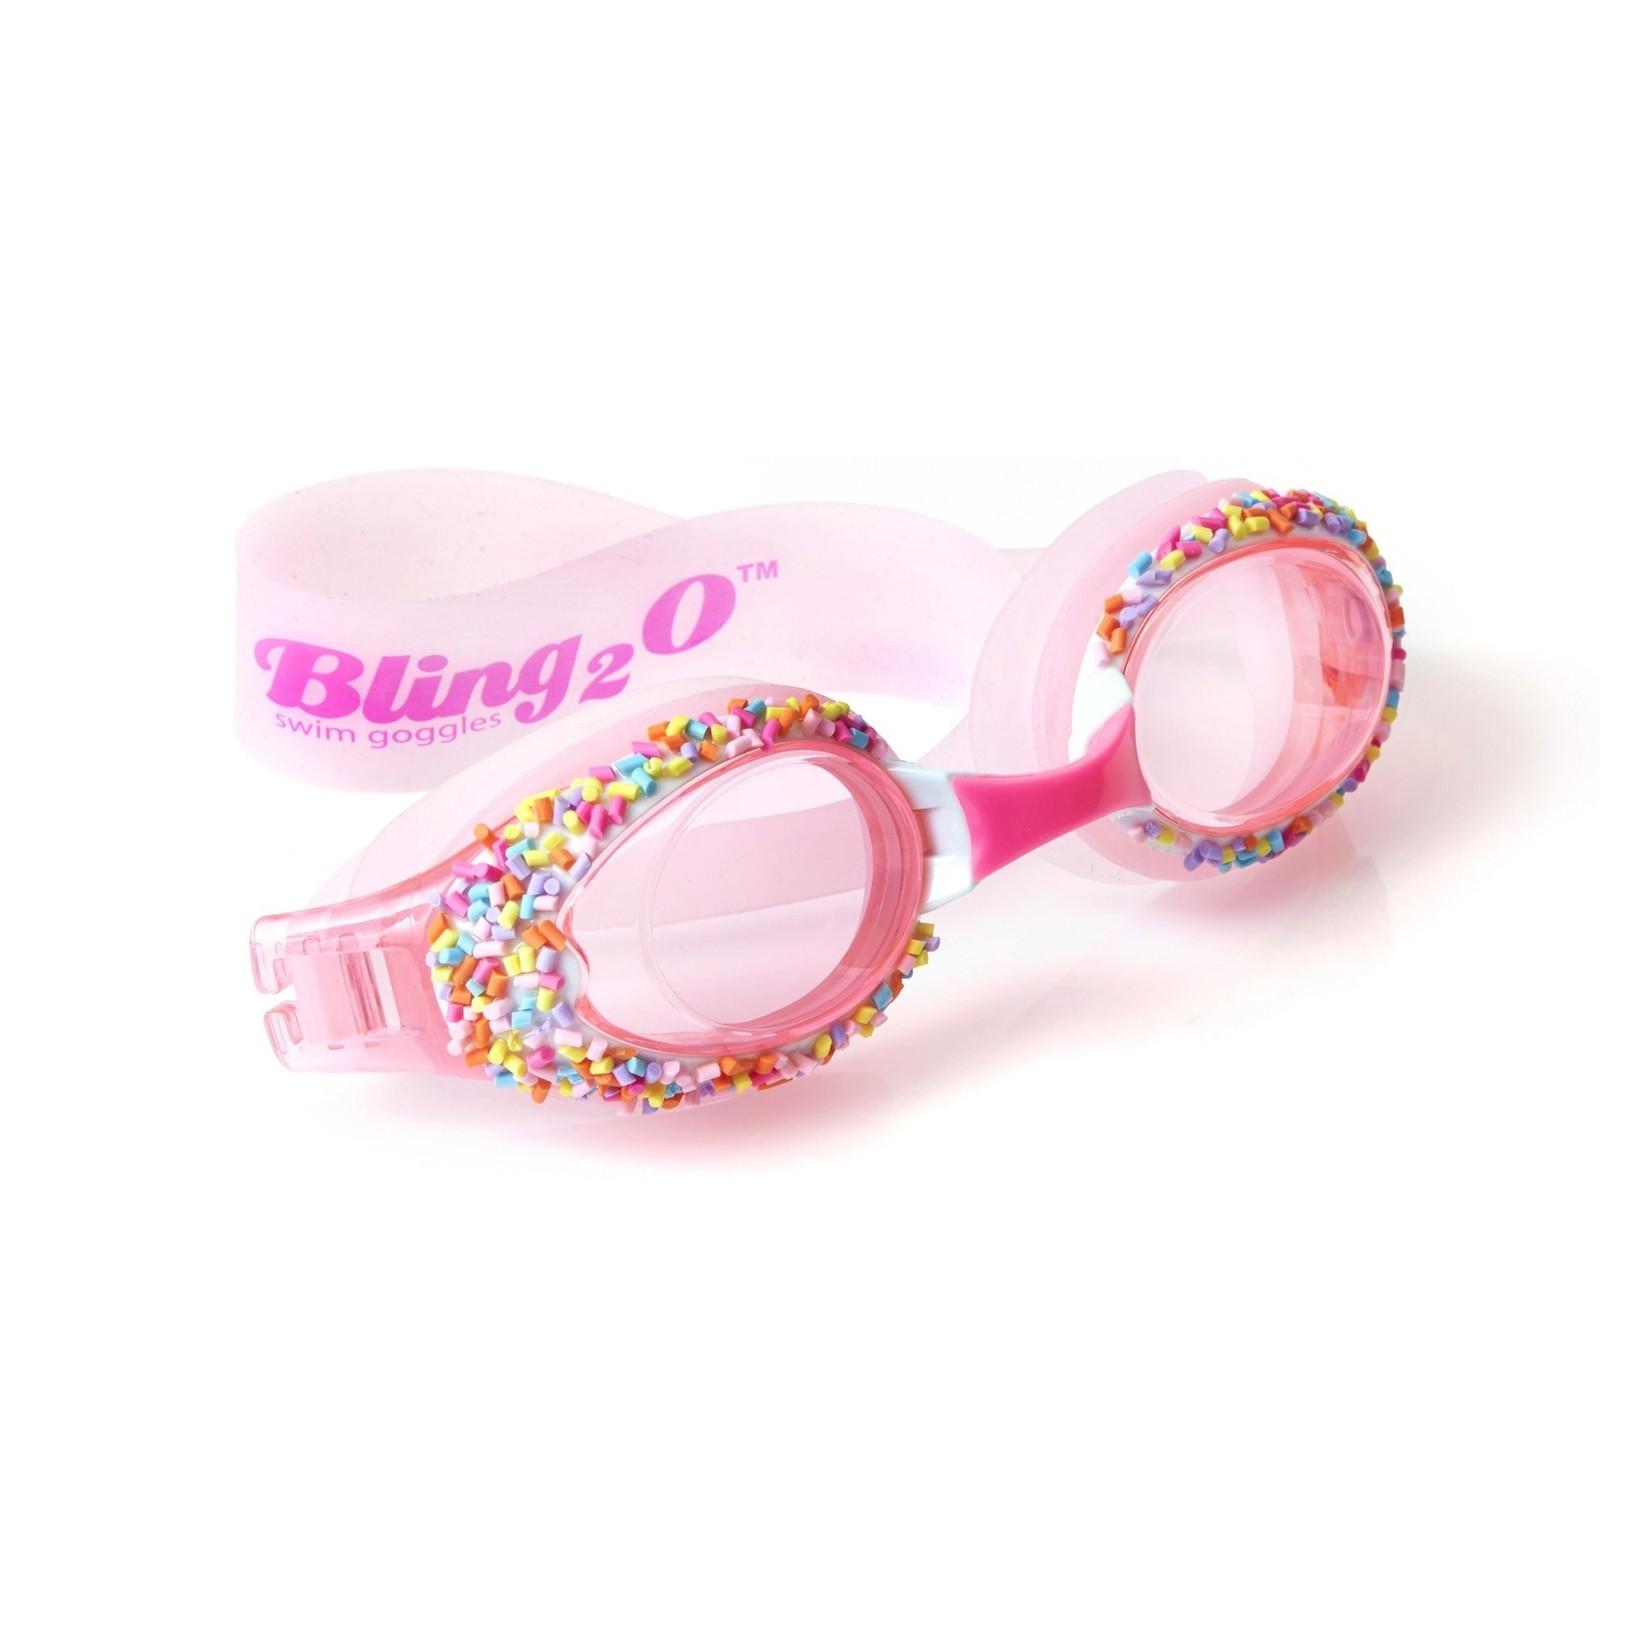 Cake Goggles